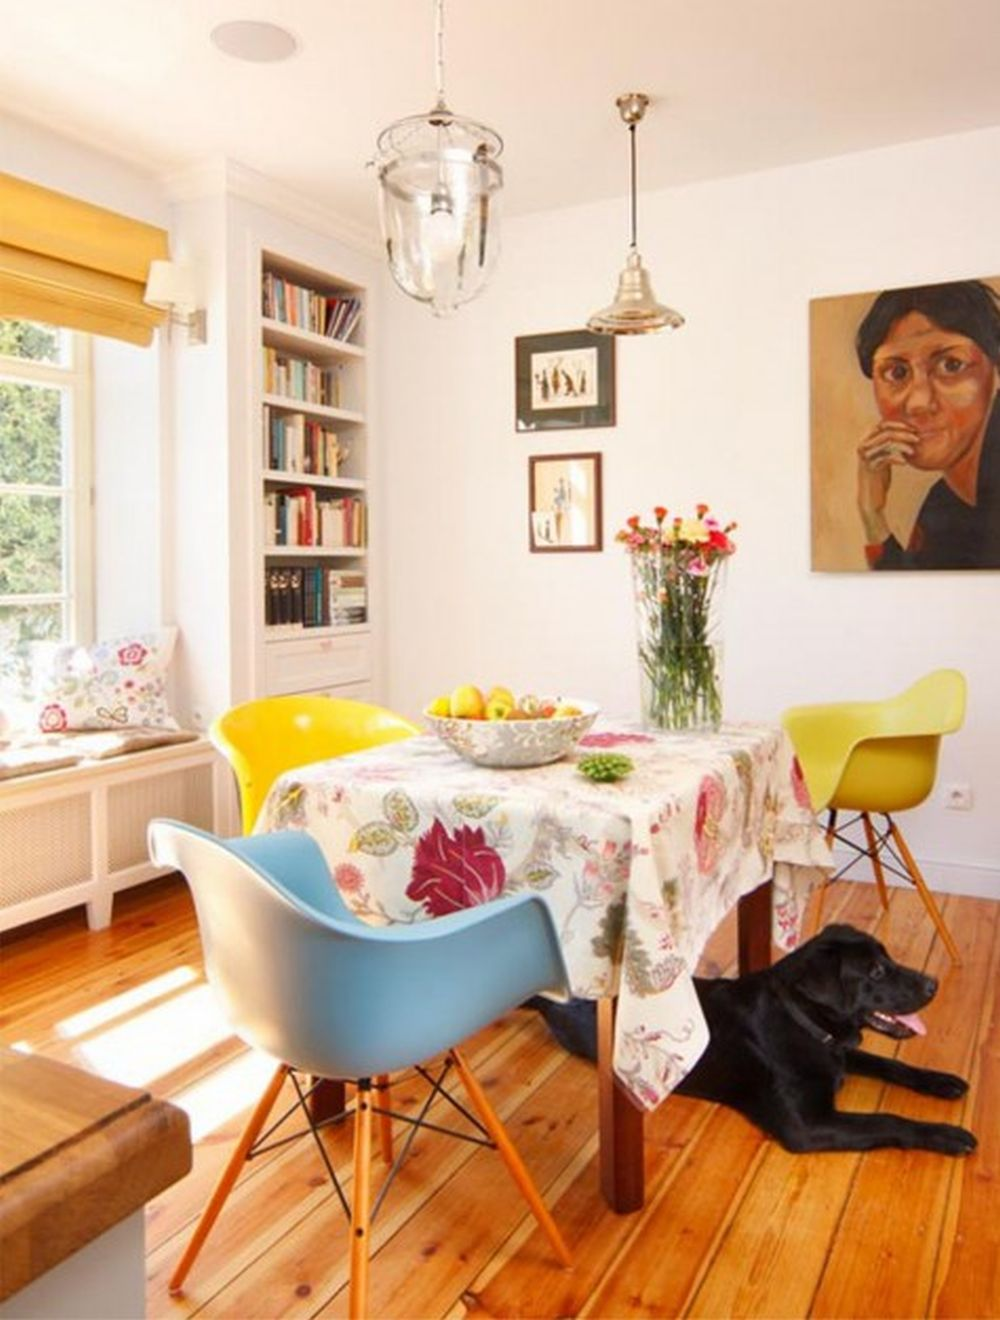 adelaparvu.com despre casa cu interior in stil englezesc, casa Polonia, design Marta Sikorska, Foto Michal Zalewski (1)